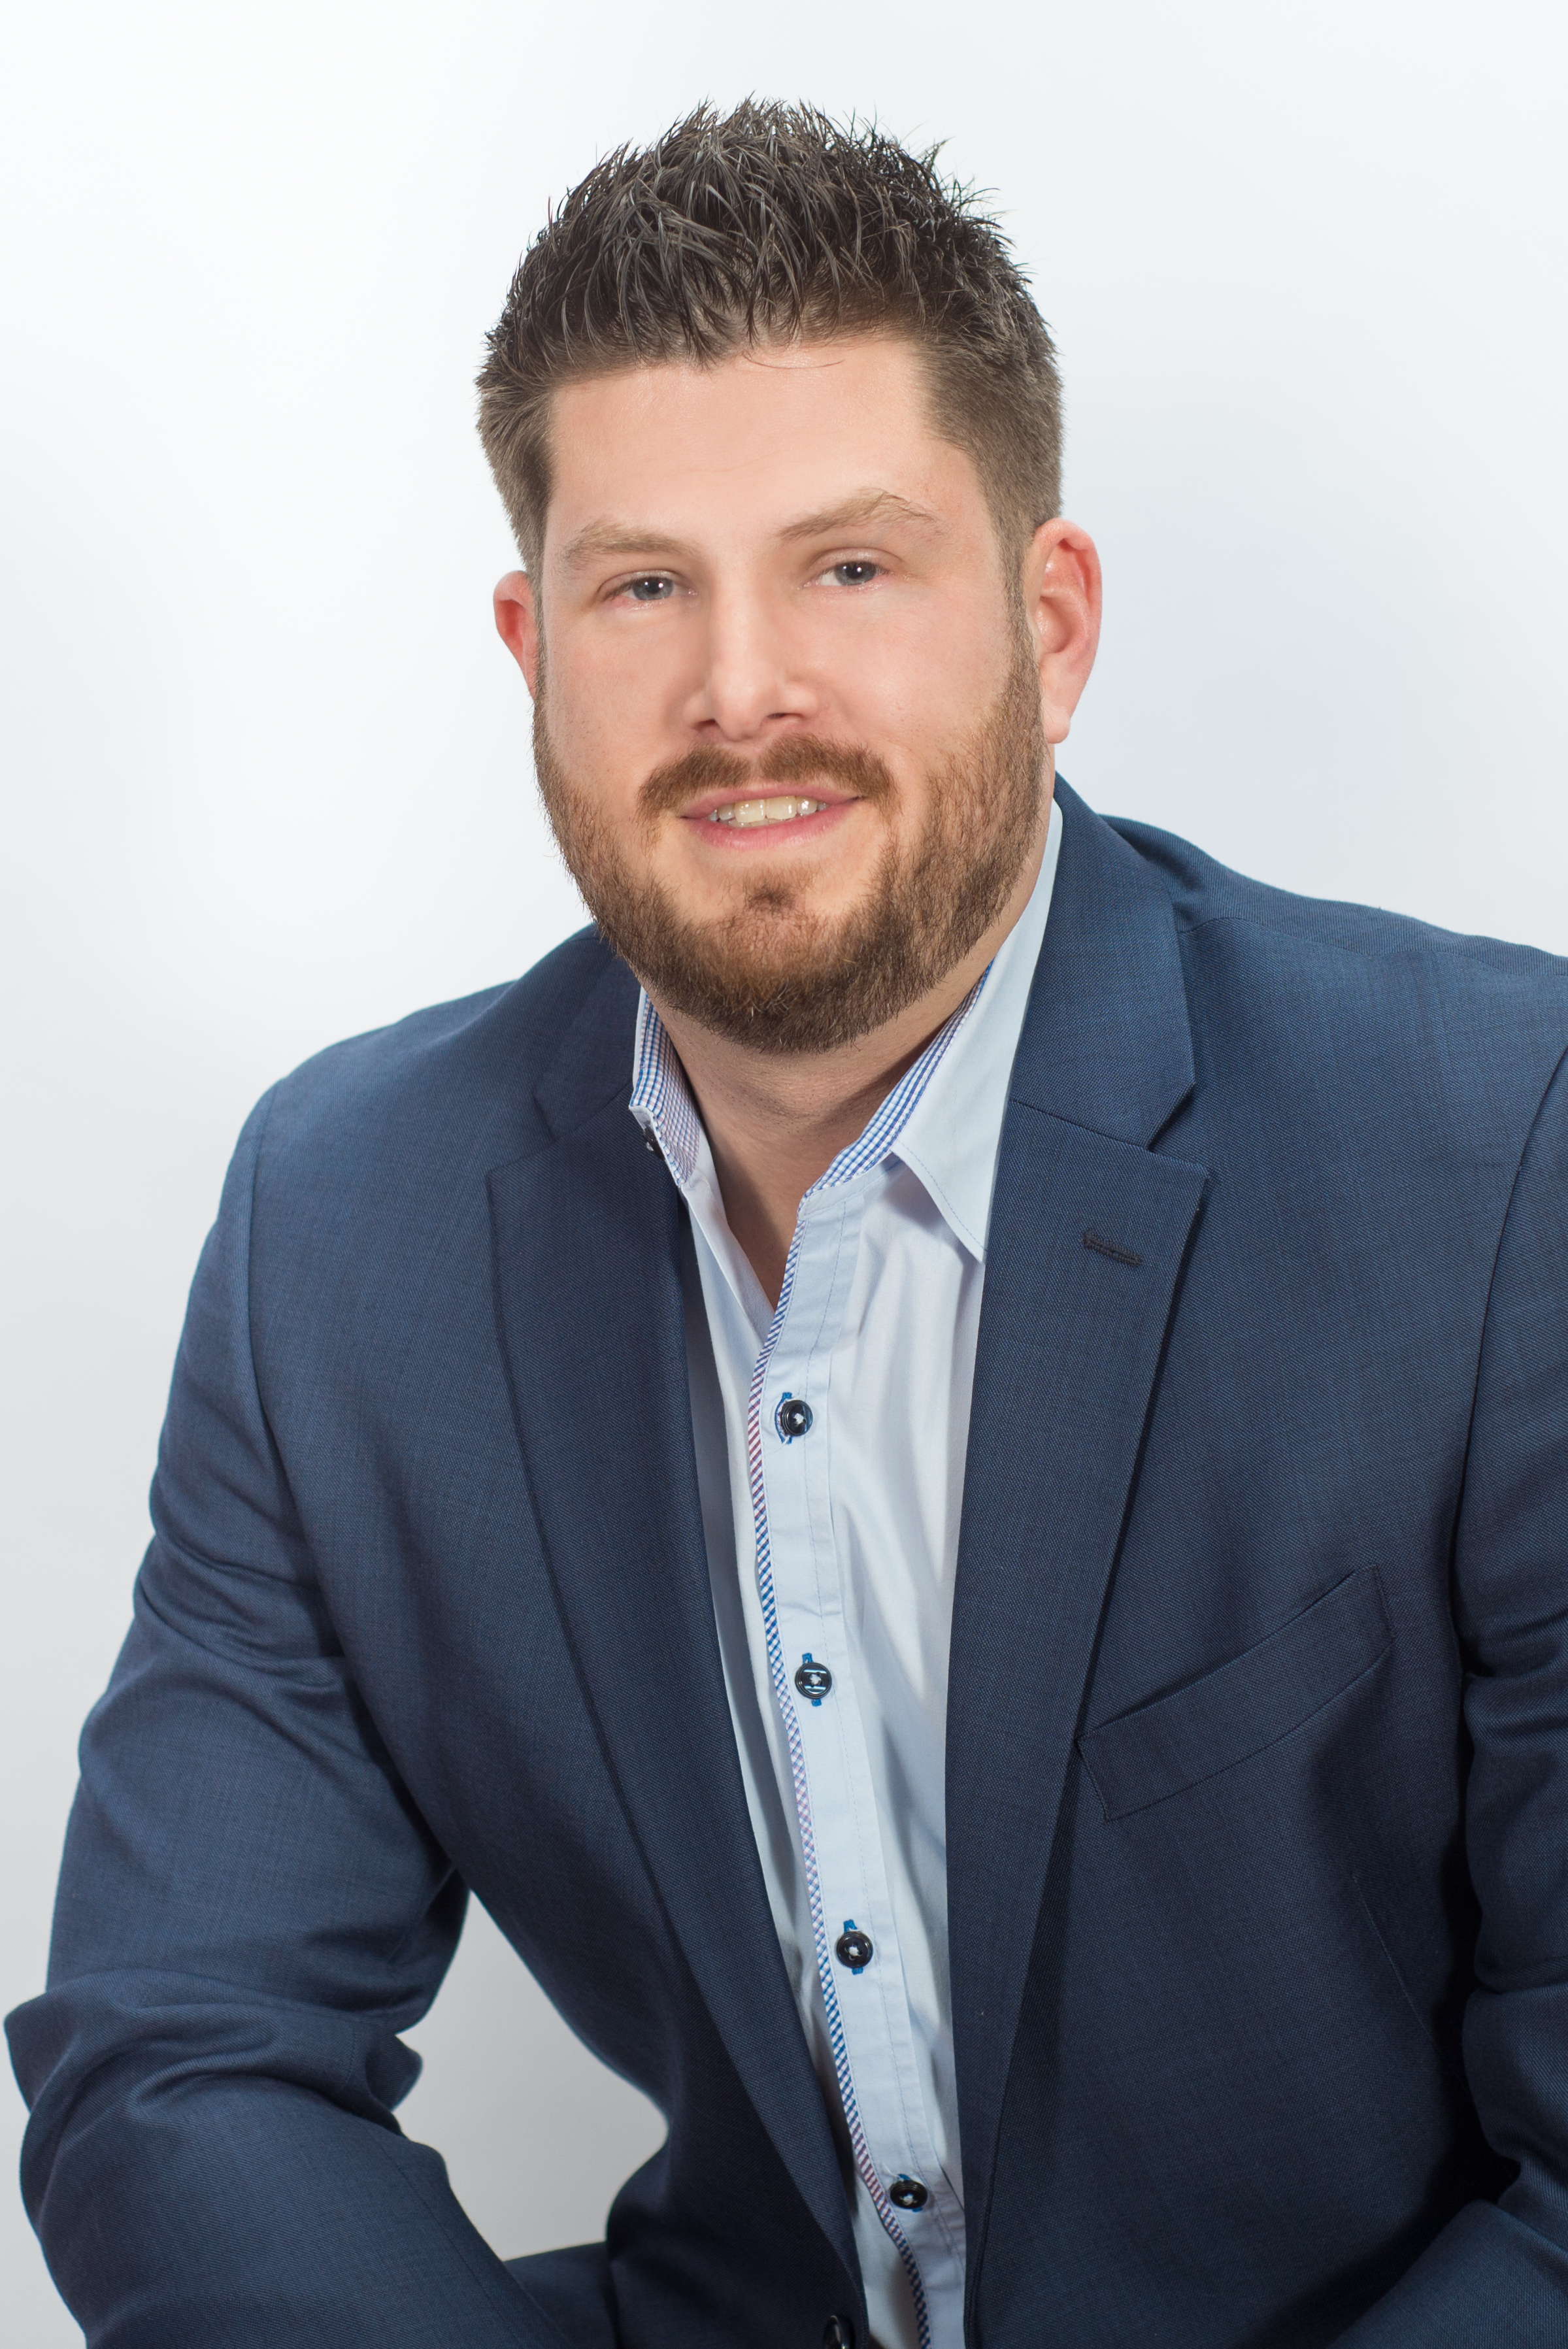 Business Insurance Agent in Washington | Allen Christopher ...